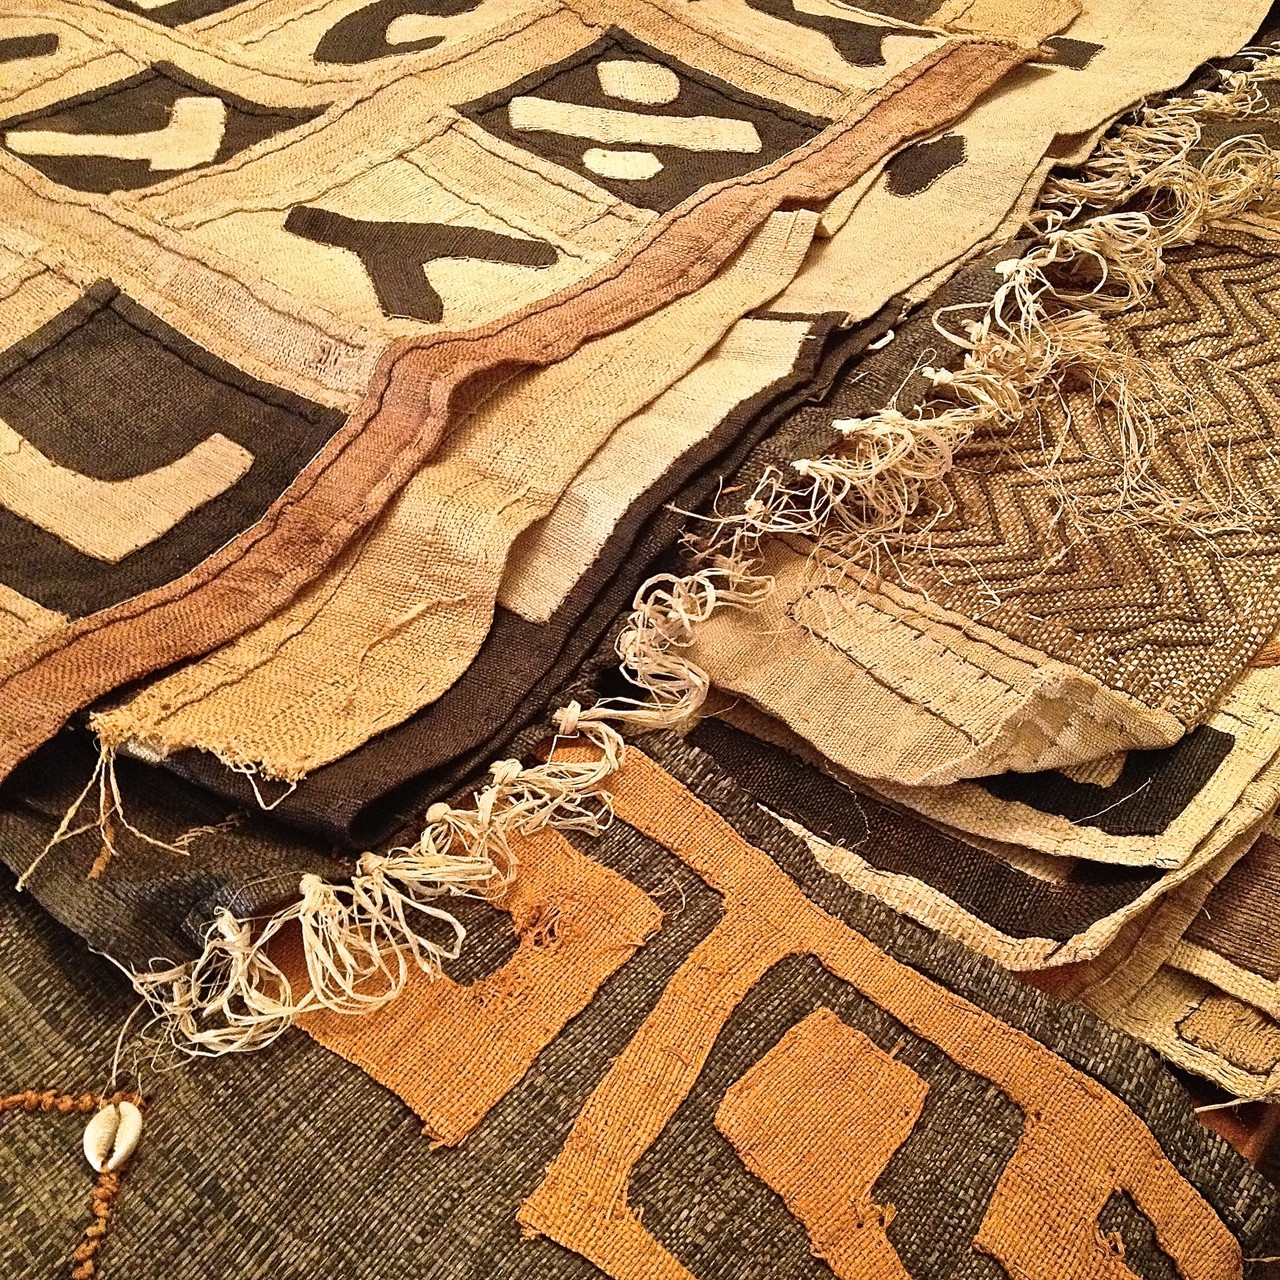 ntshak-raffia fabrics kuba congo-textile decoration-furnishing Africa 273cm x 52cm